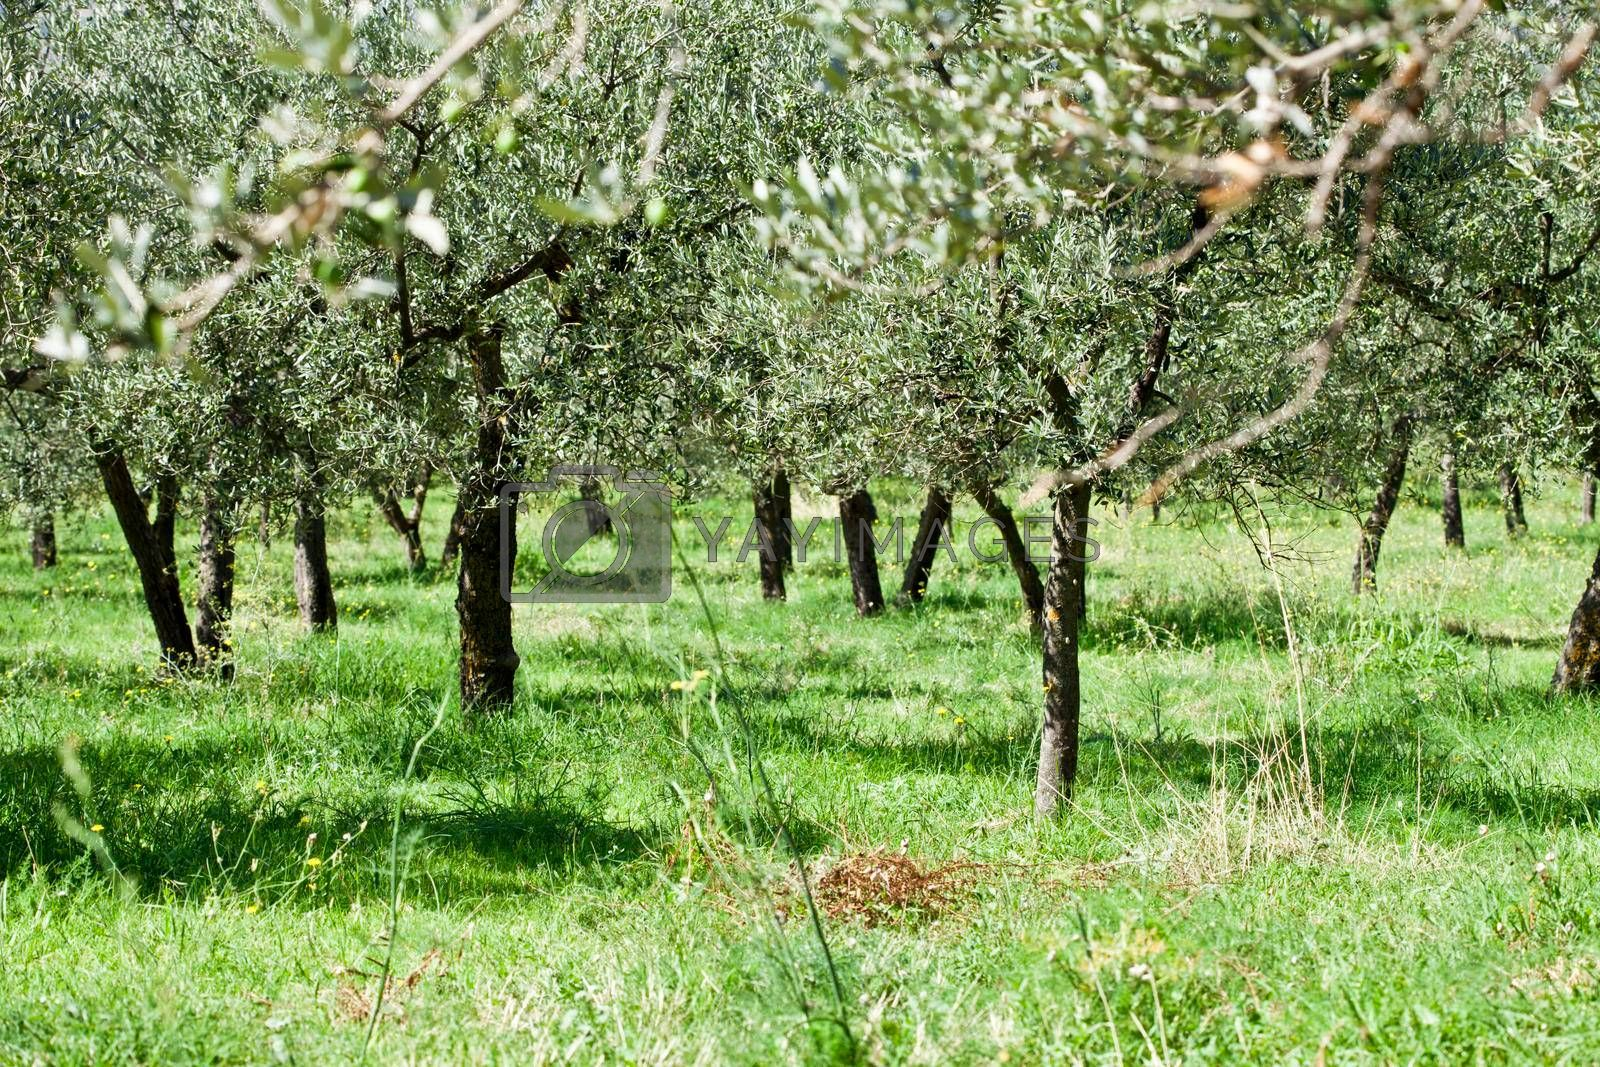 Olive trees plantation. Season and harvest nature image. Italy.